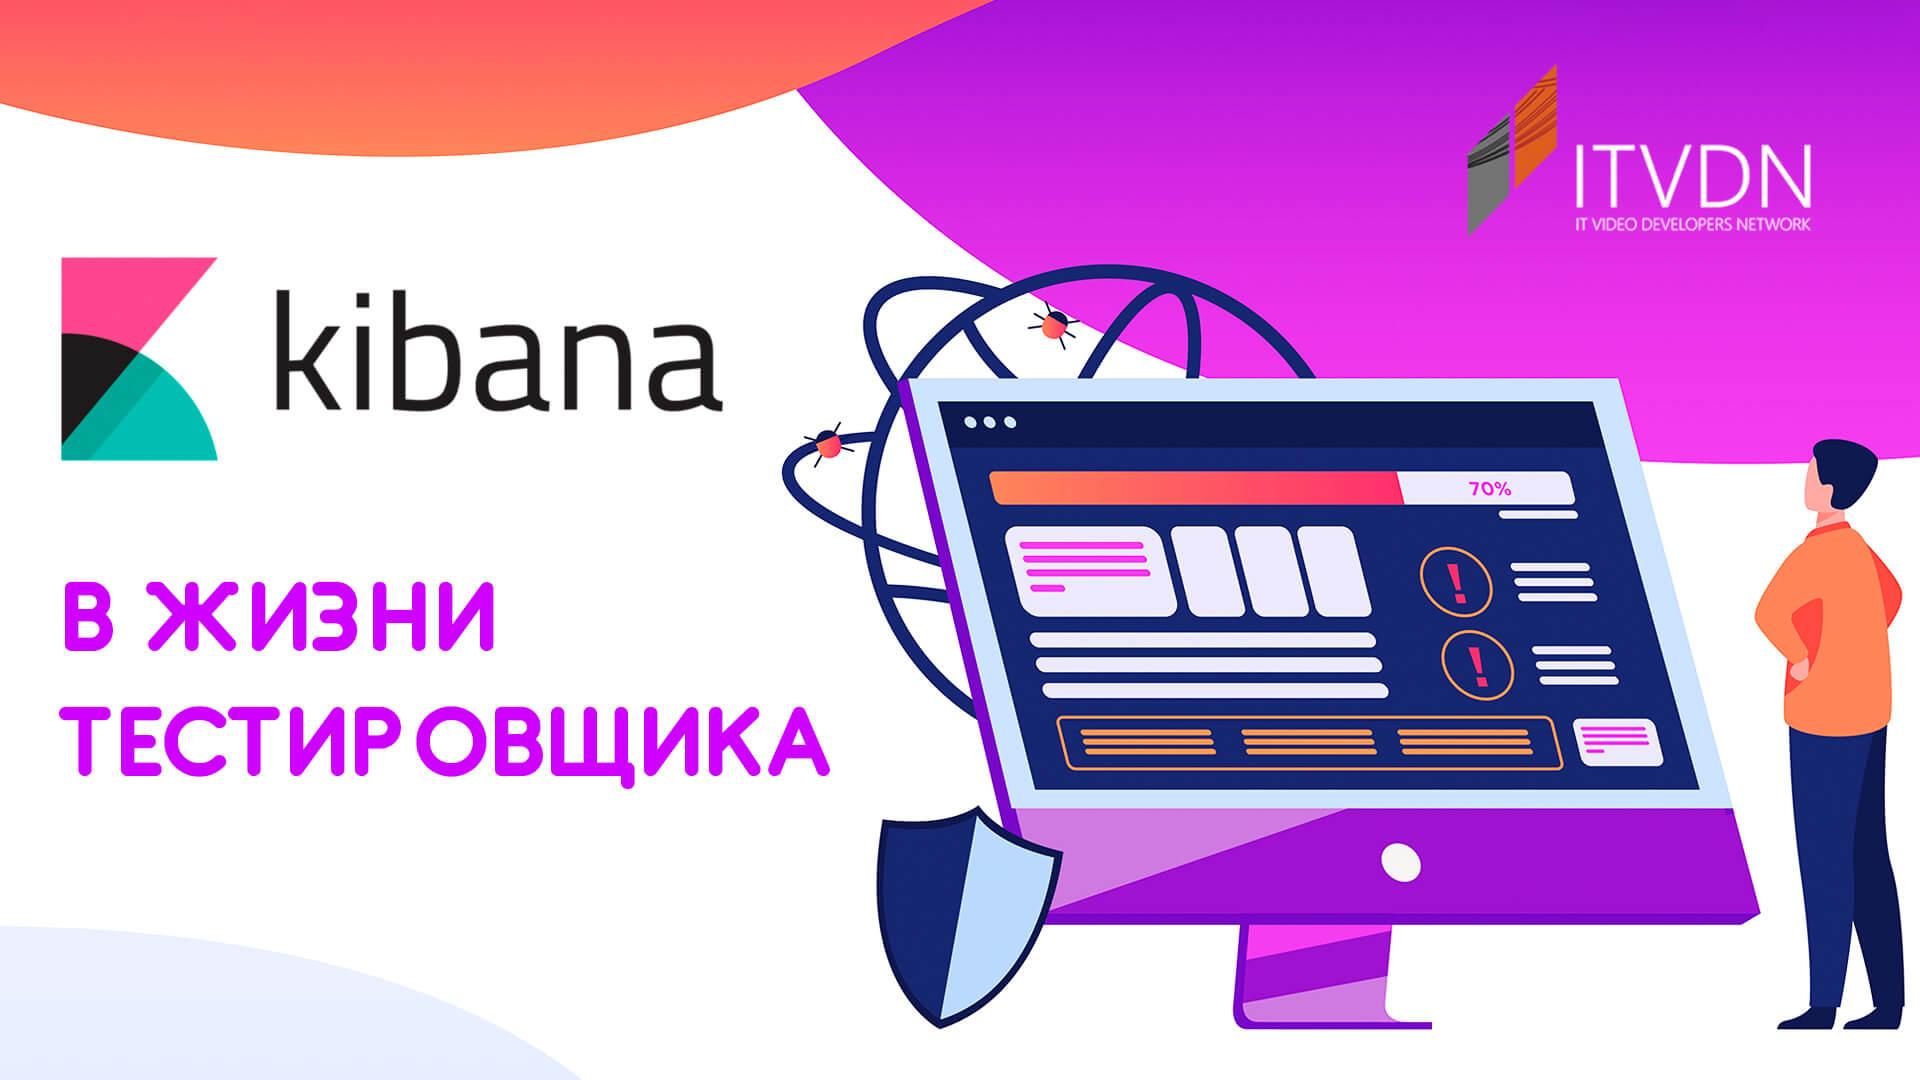 fake webinar image